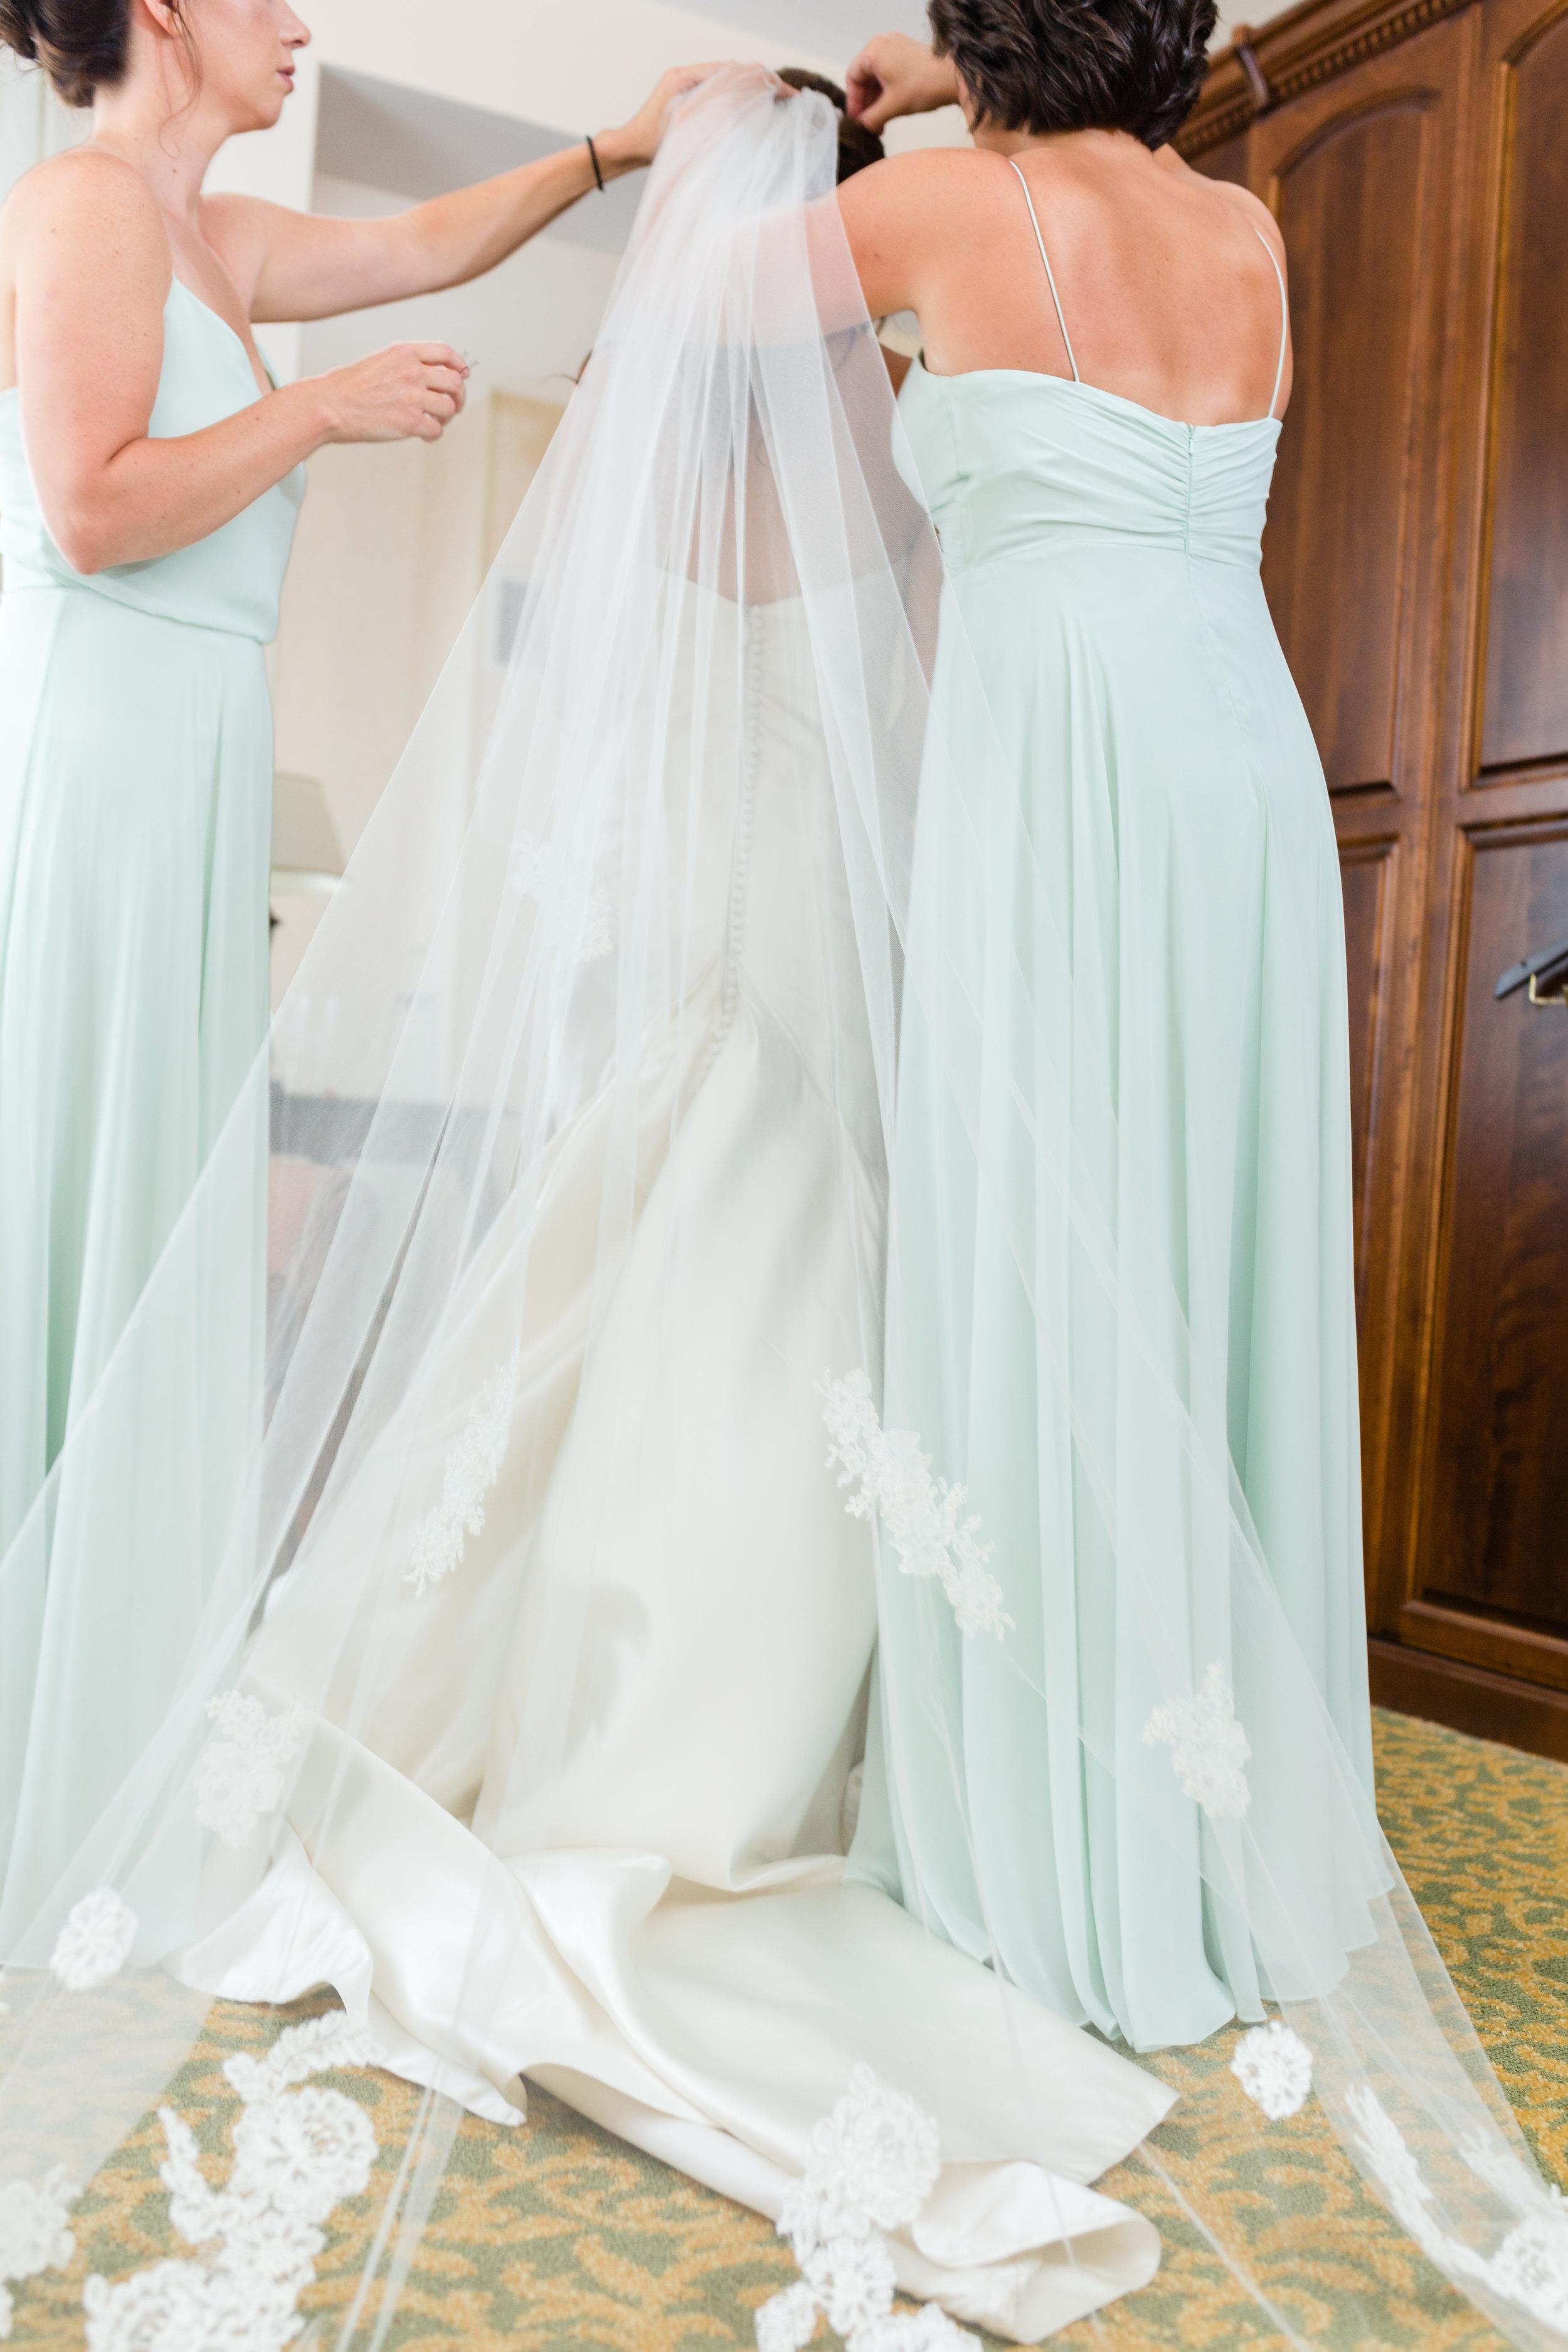 j r wedding blog-50.jpg